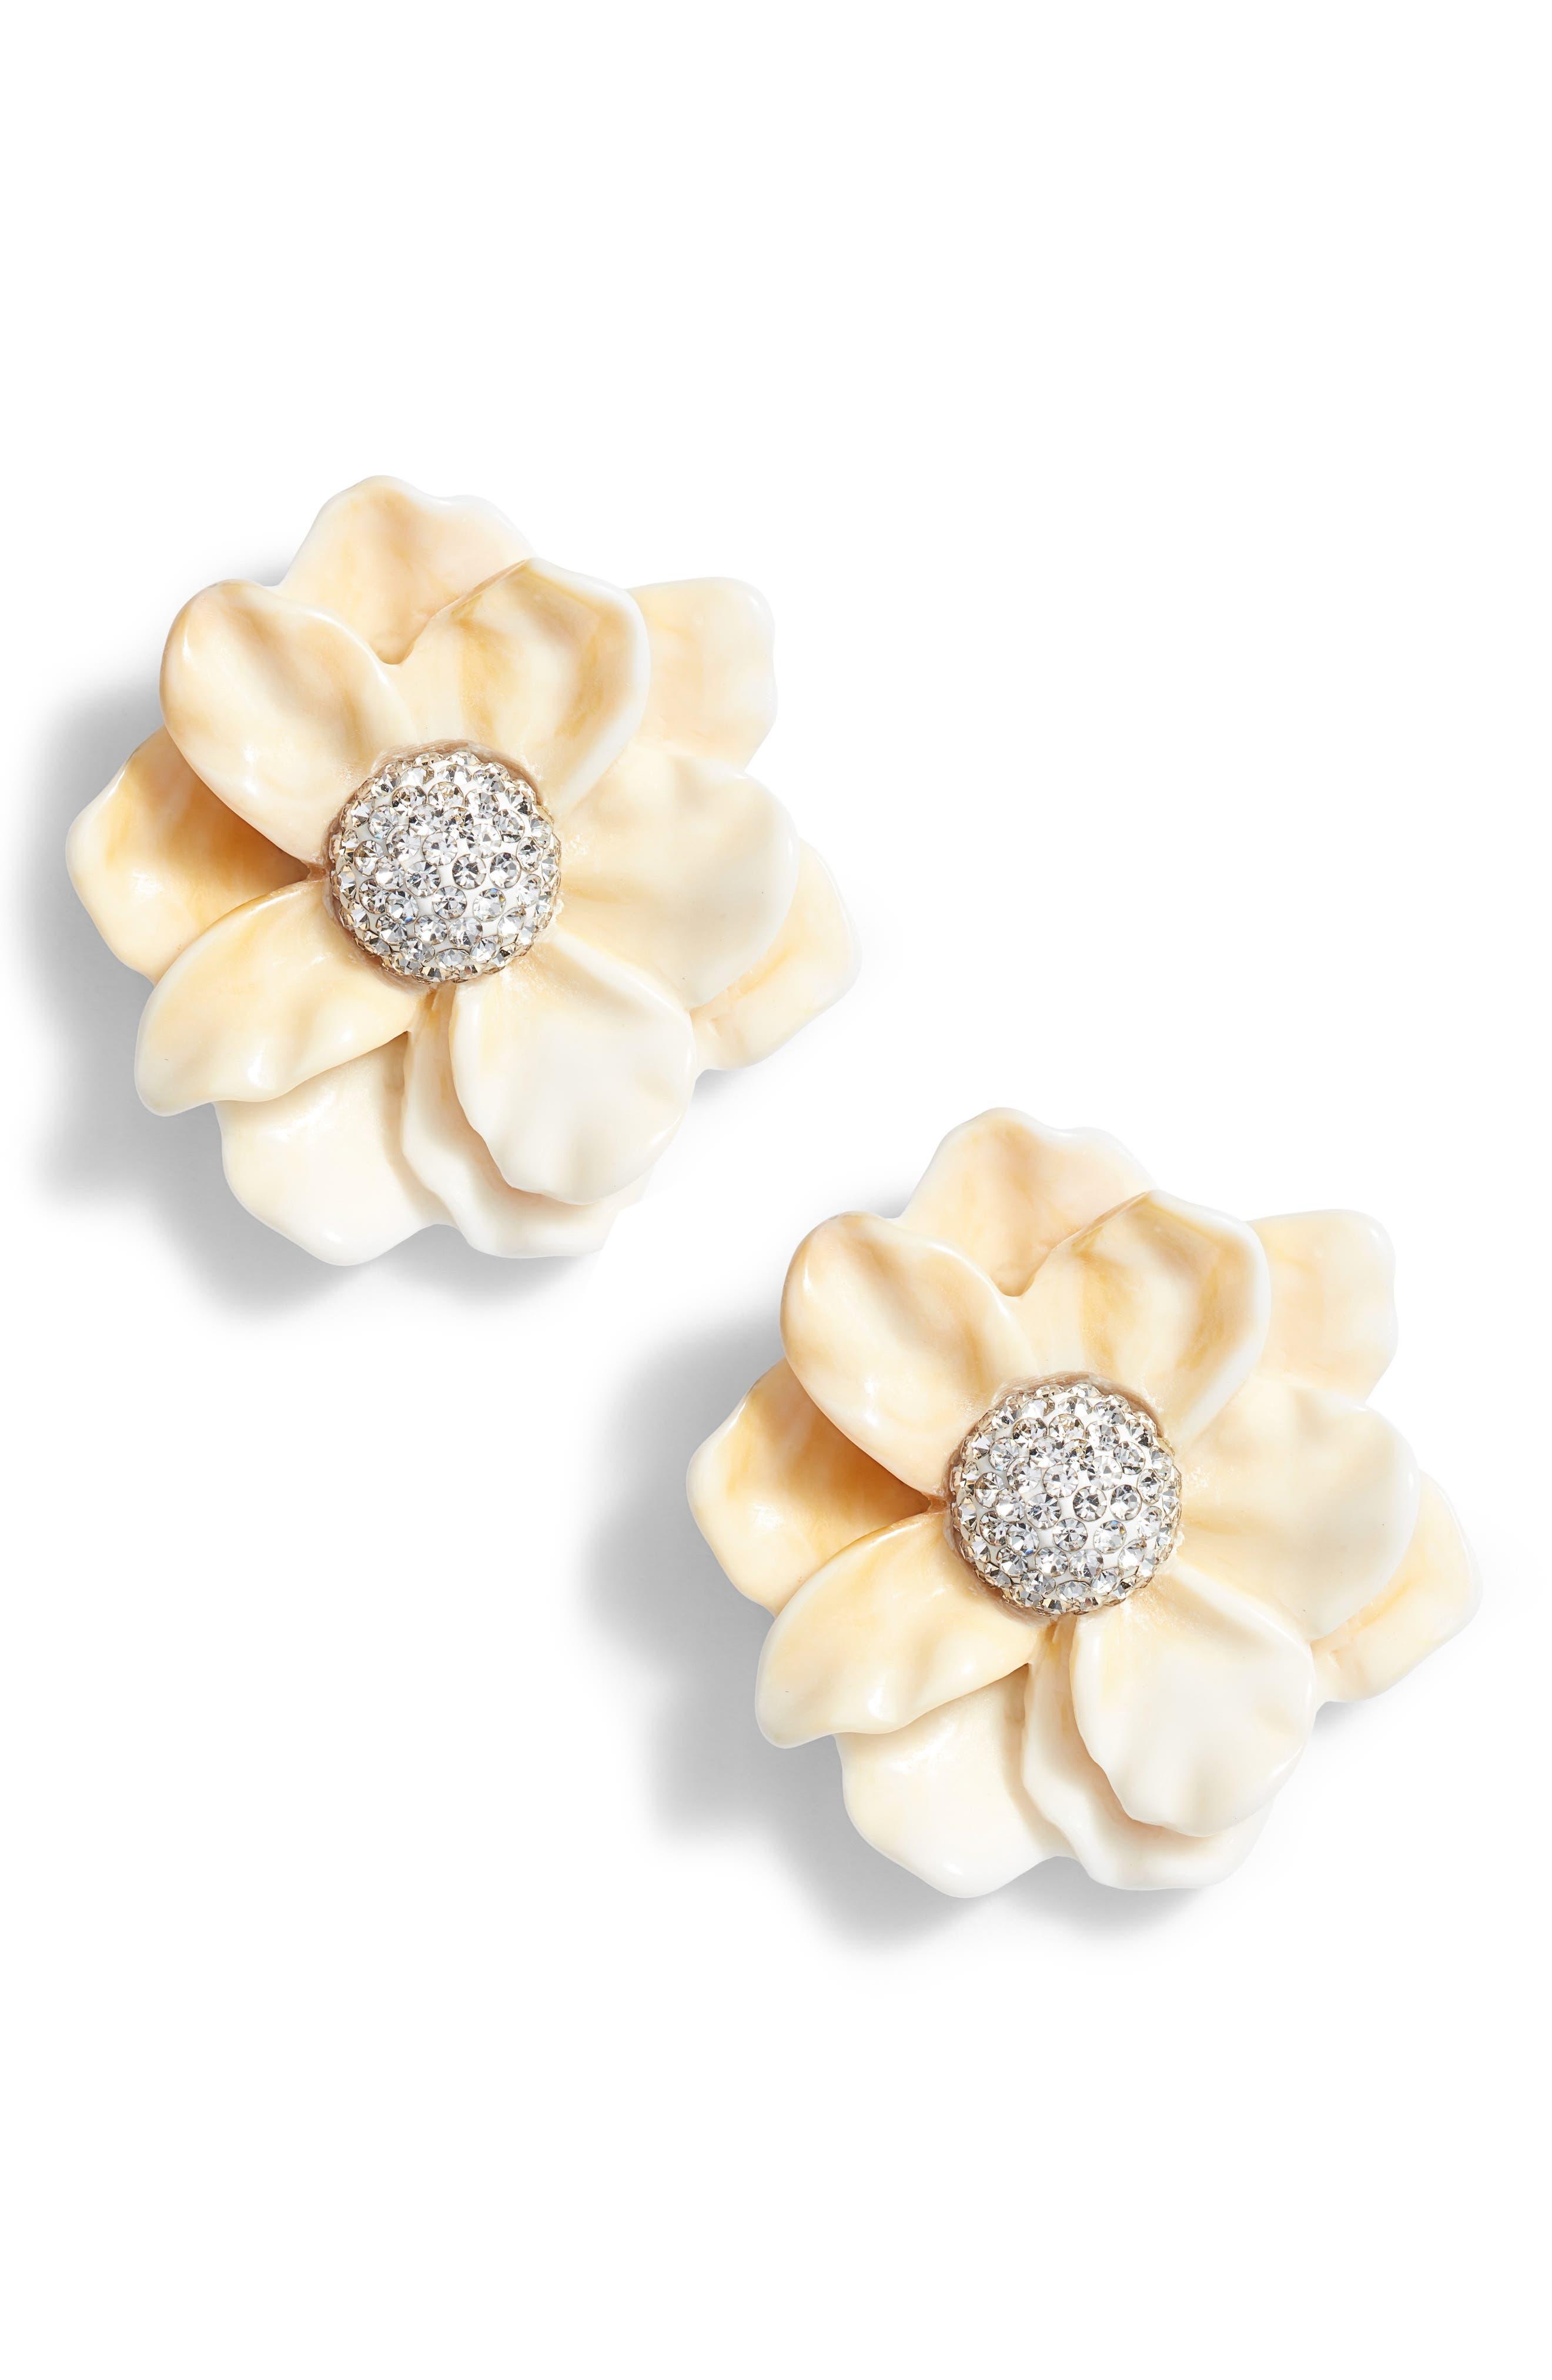 LELE SADOUGHI Oversized Gardenia Stud Earrings, Main, color, 900